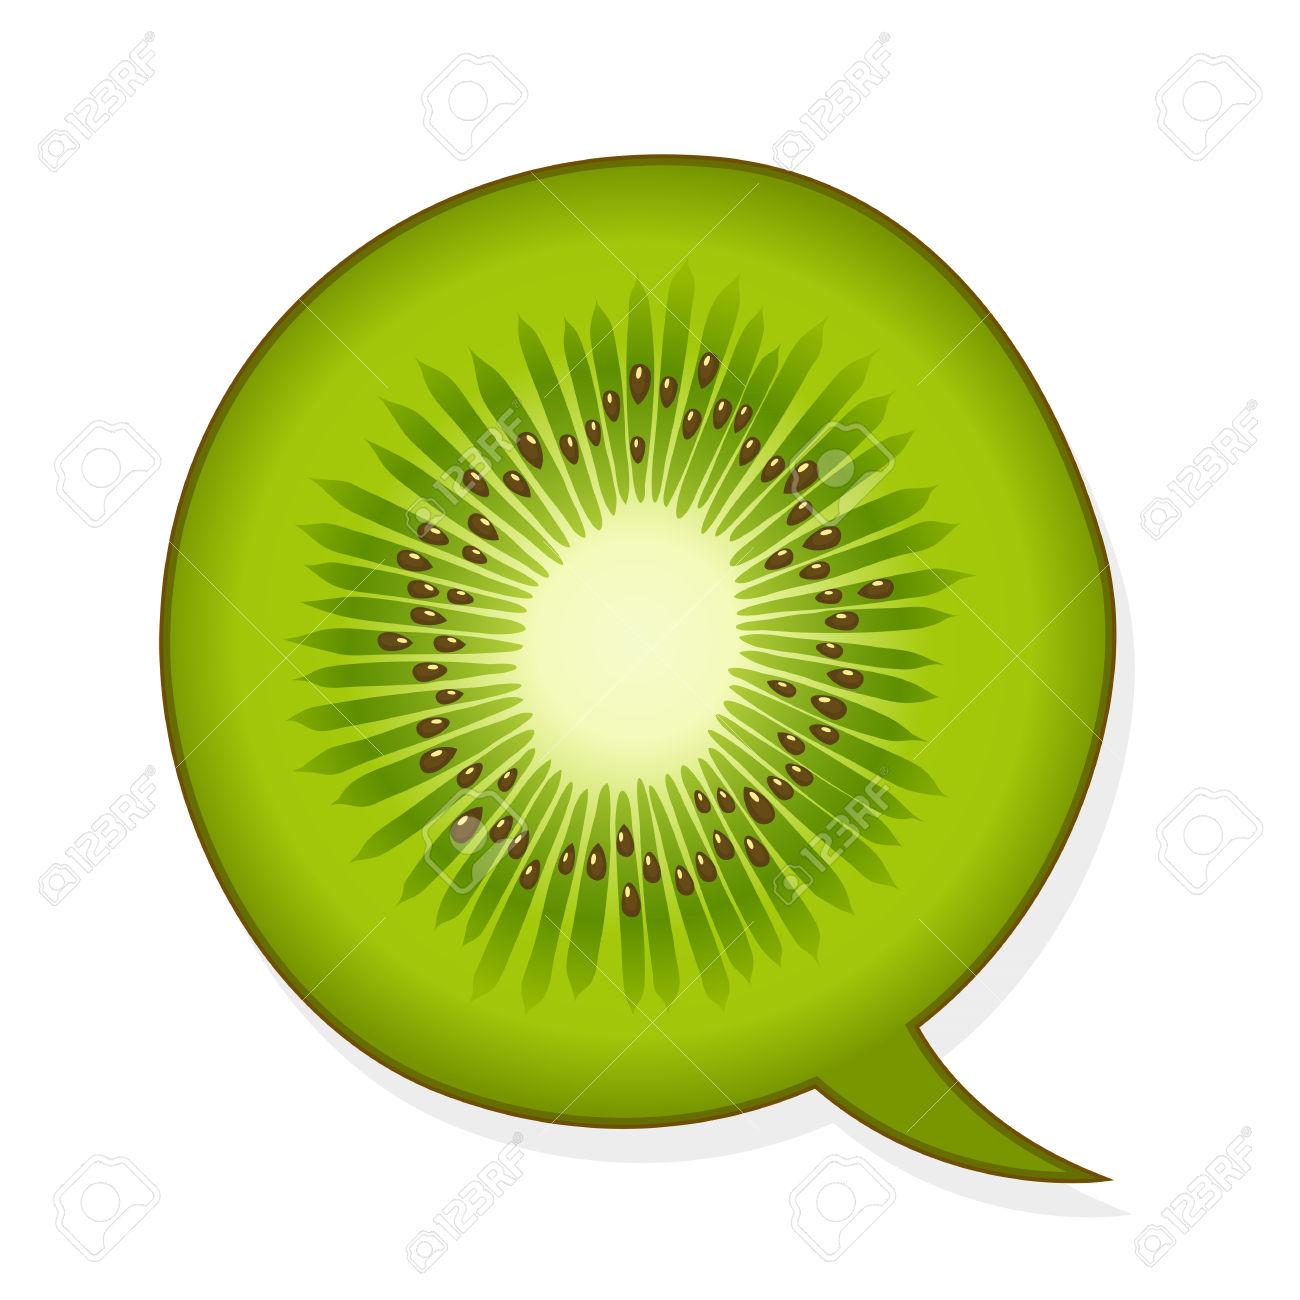 Speech Bubble In The Shape Of A Juicy Green Tropical Kiwifruit.